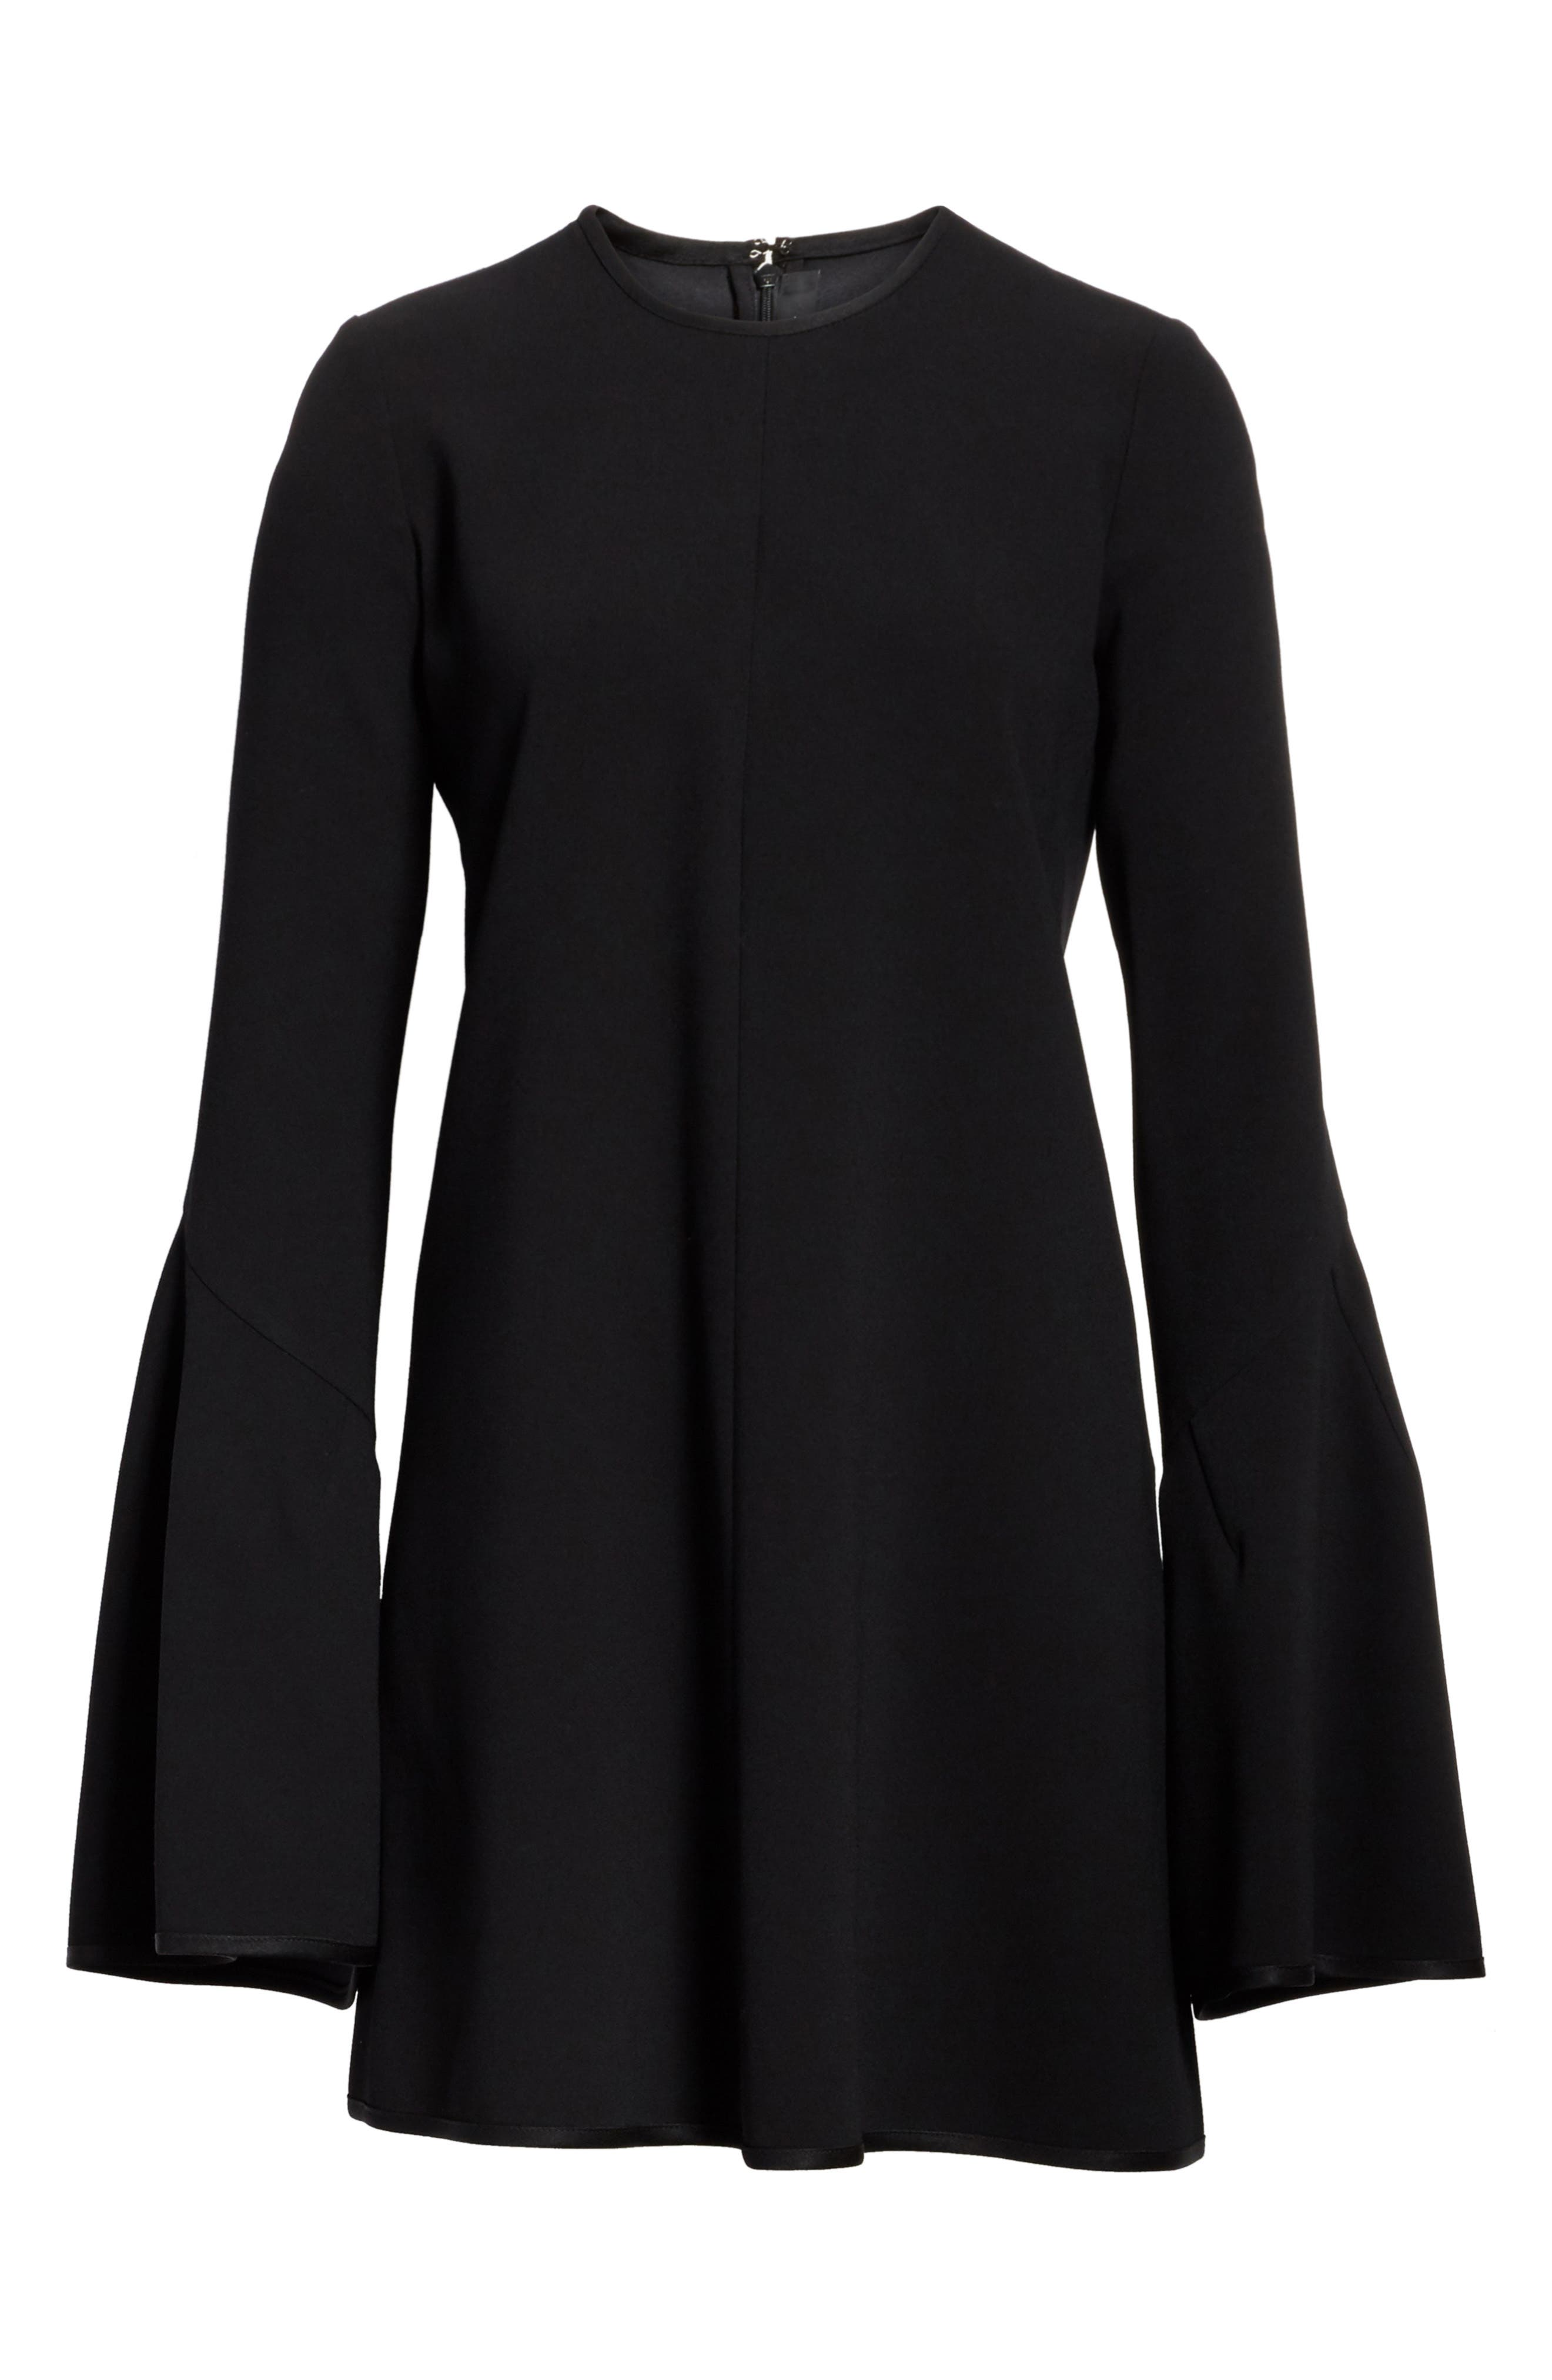 Preacher Flare Sleeve Minidress,                             Alternate thumbnail 4, color,                             Black